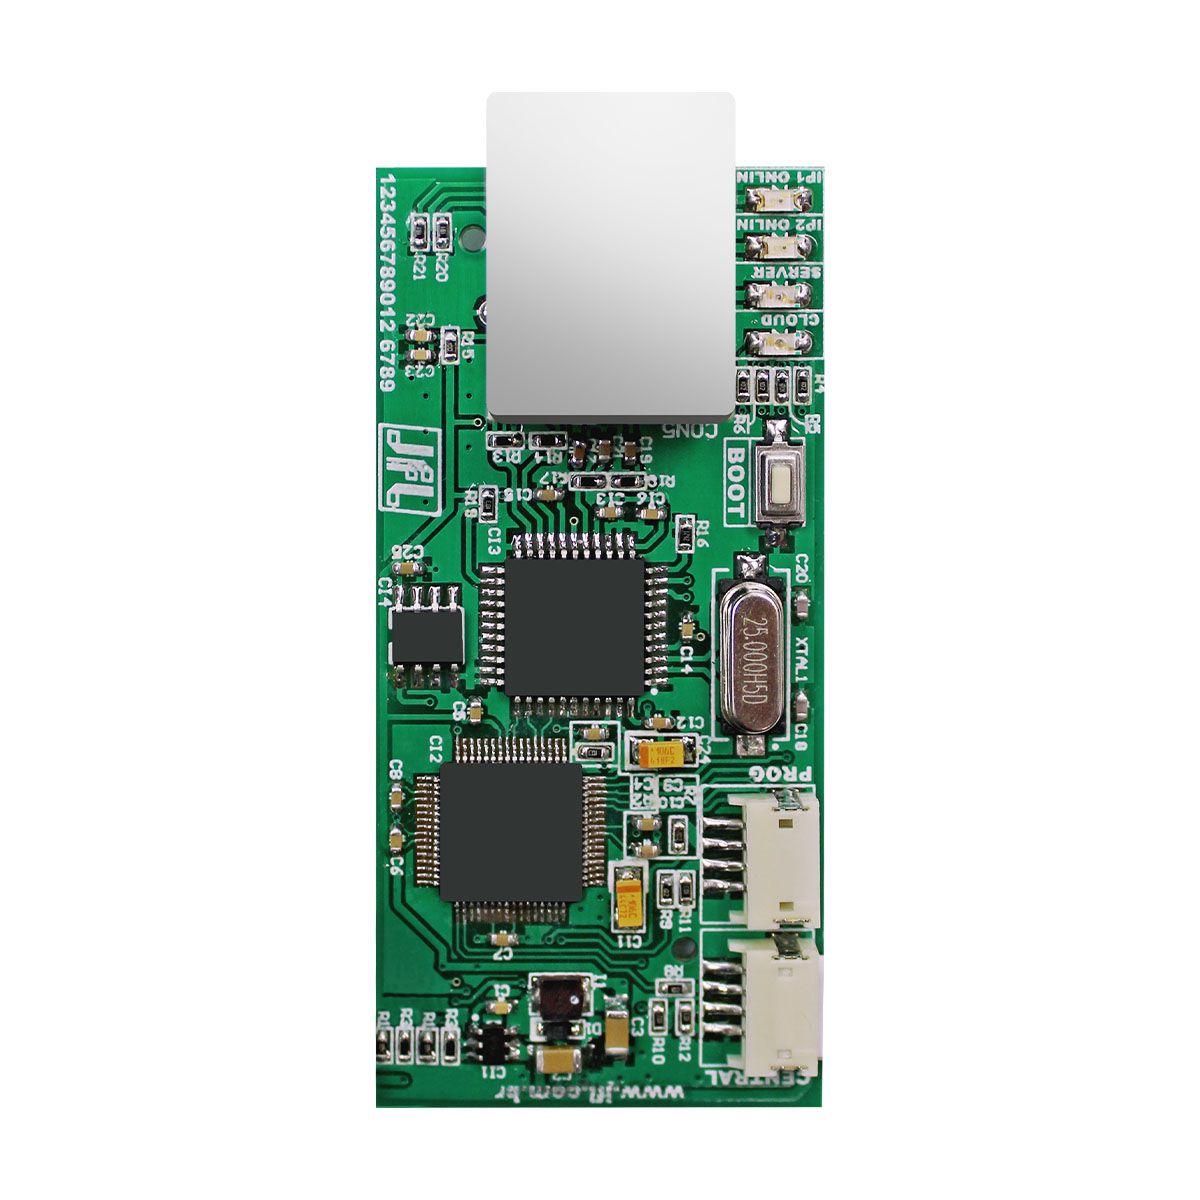 Kit Alarme Smart Cloud 18 Jfl Com 5 Sensores Idx 1001